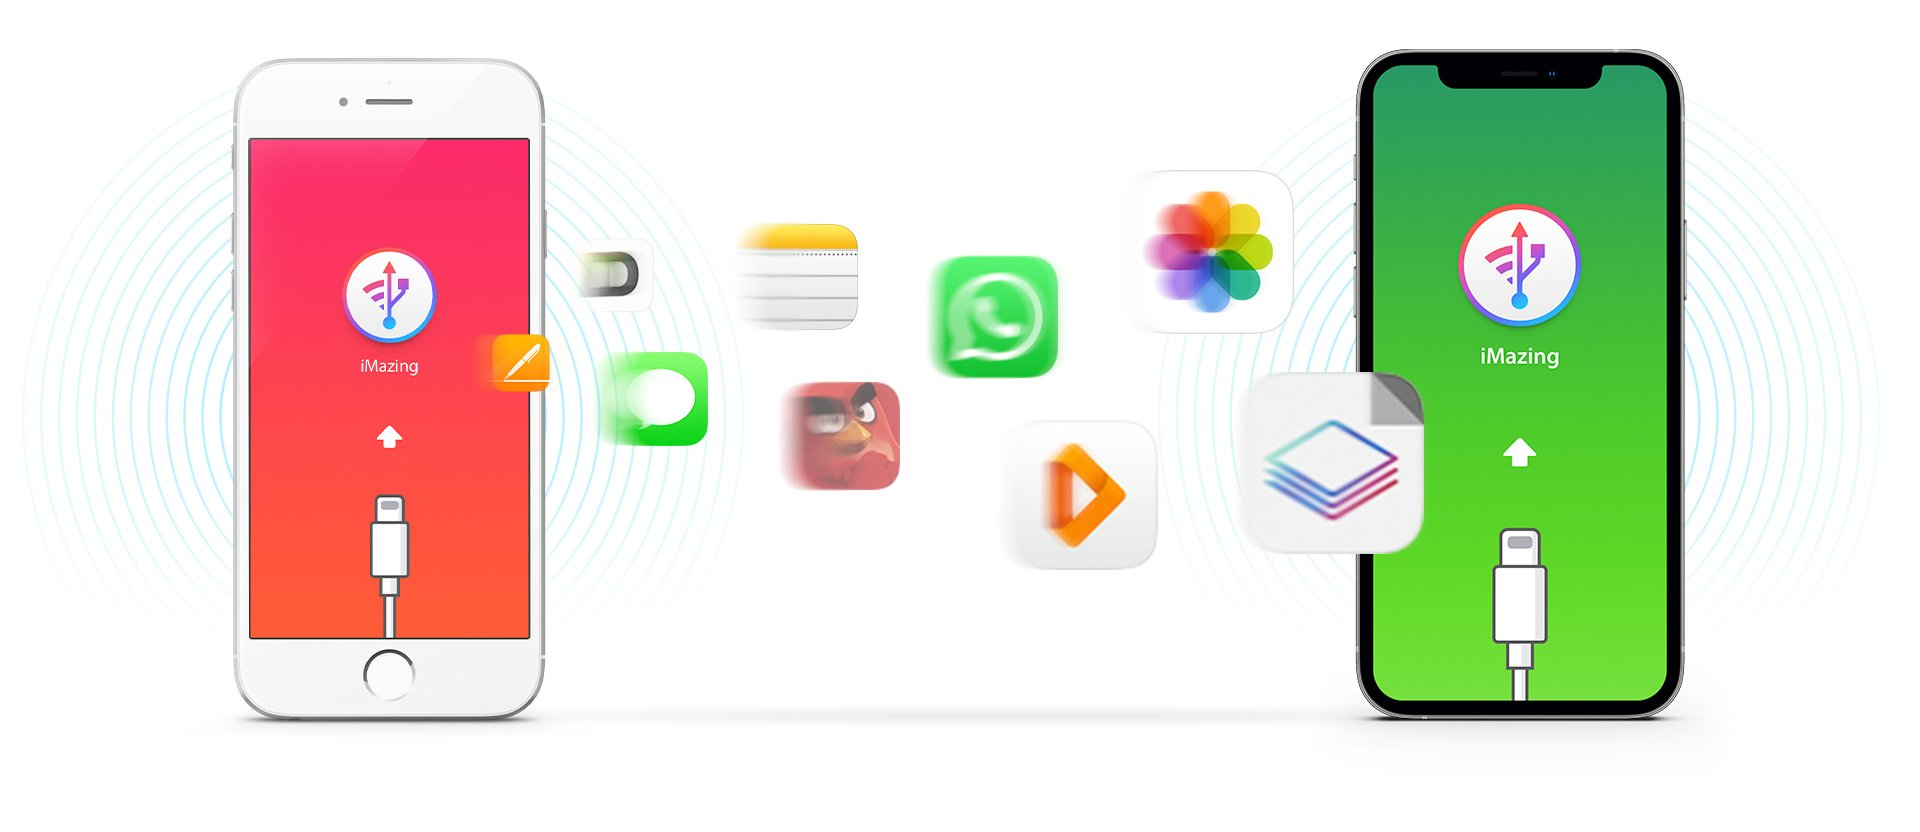 iMazing for Mac 2.6.0 破解版 – 优秀的iOS设备管理工具-麦氪派(WaitsUn.com | 爱情守望者)